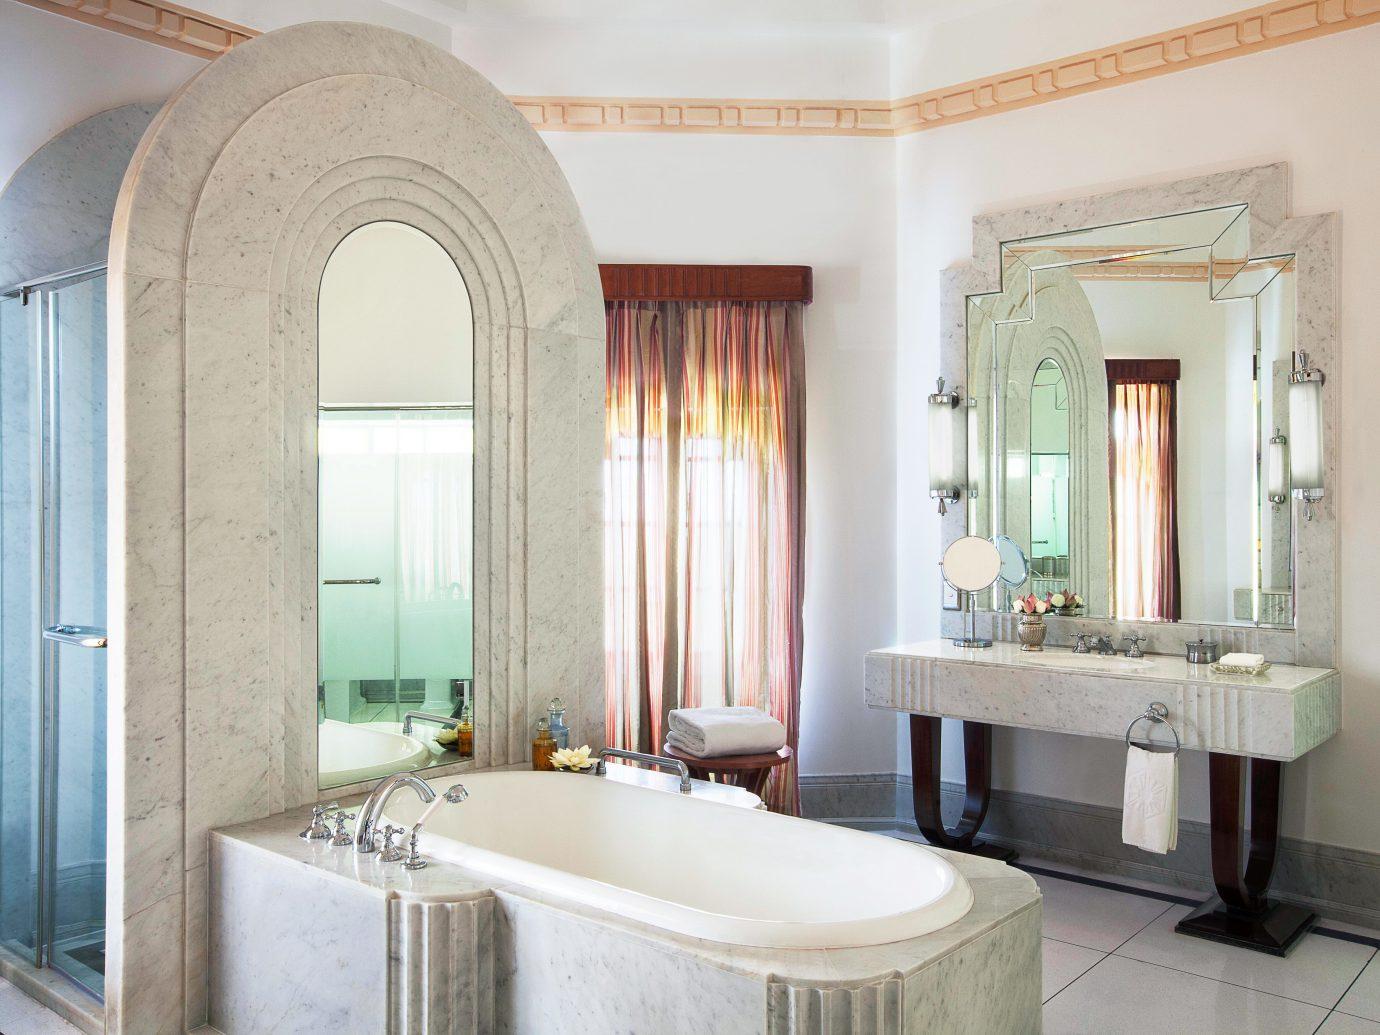 Bath Elegant Hotels Living Luxury Resort indoor wall window bathroom room property estate home interior design Suite floor real estate mansion tub bathtub